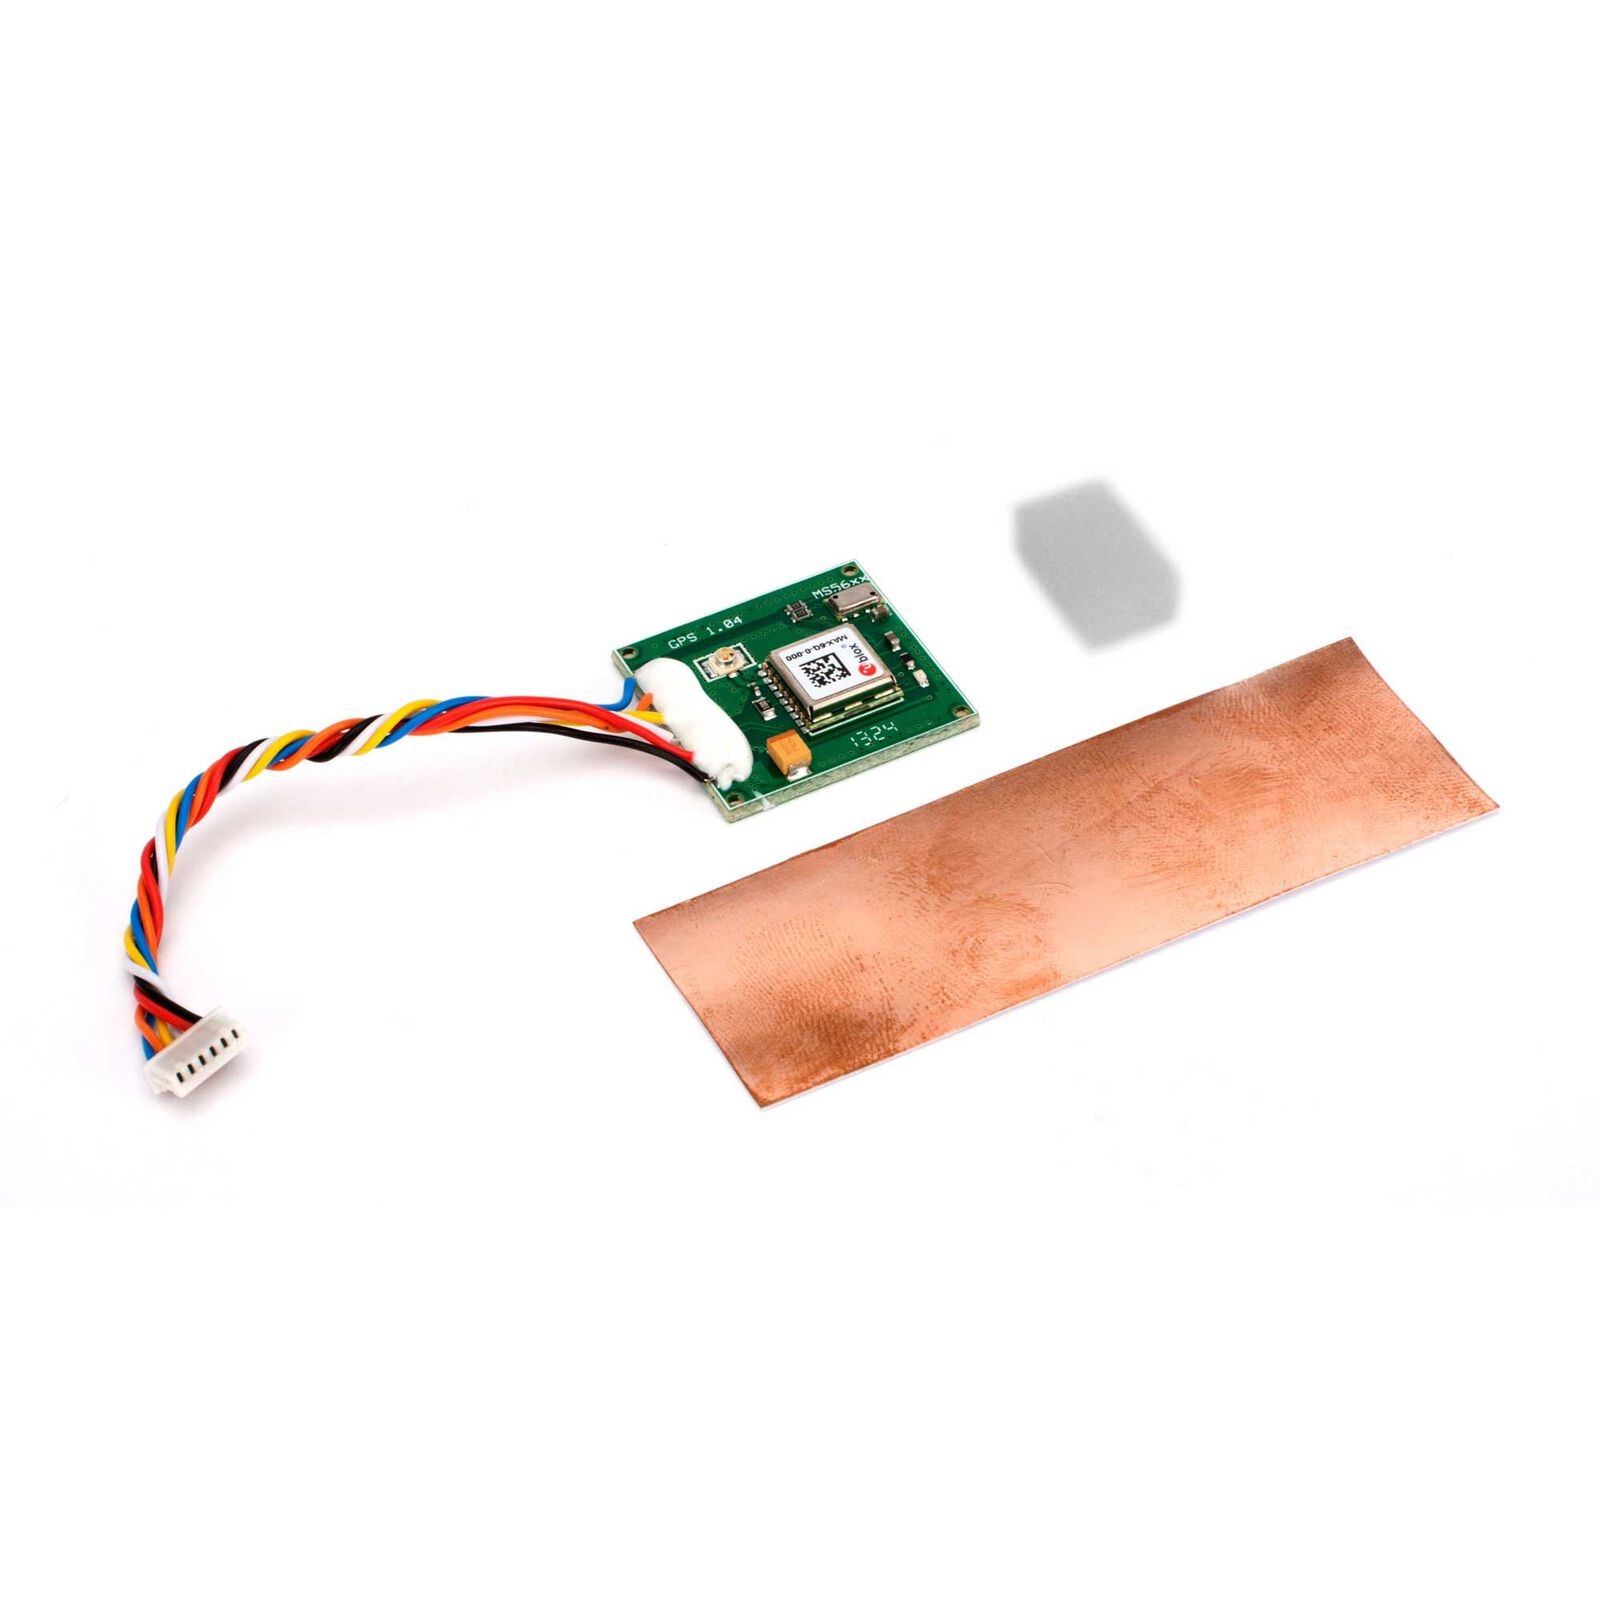 GPS Receiver with Altimeter: 350 QX